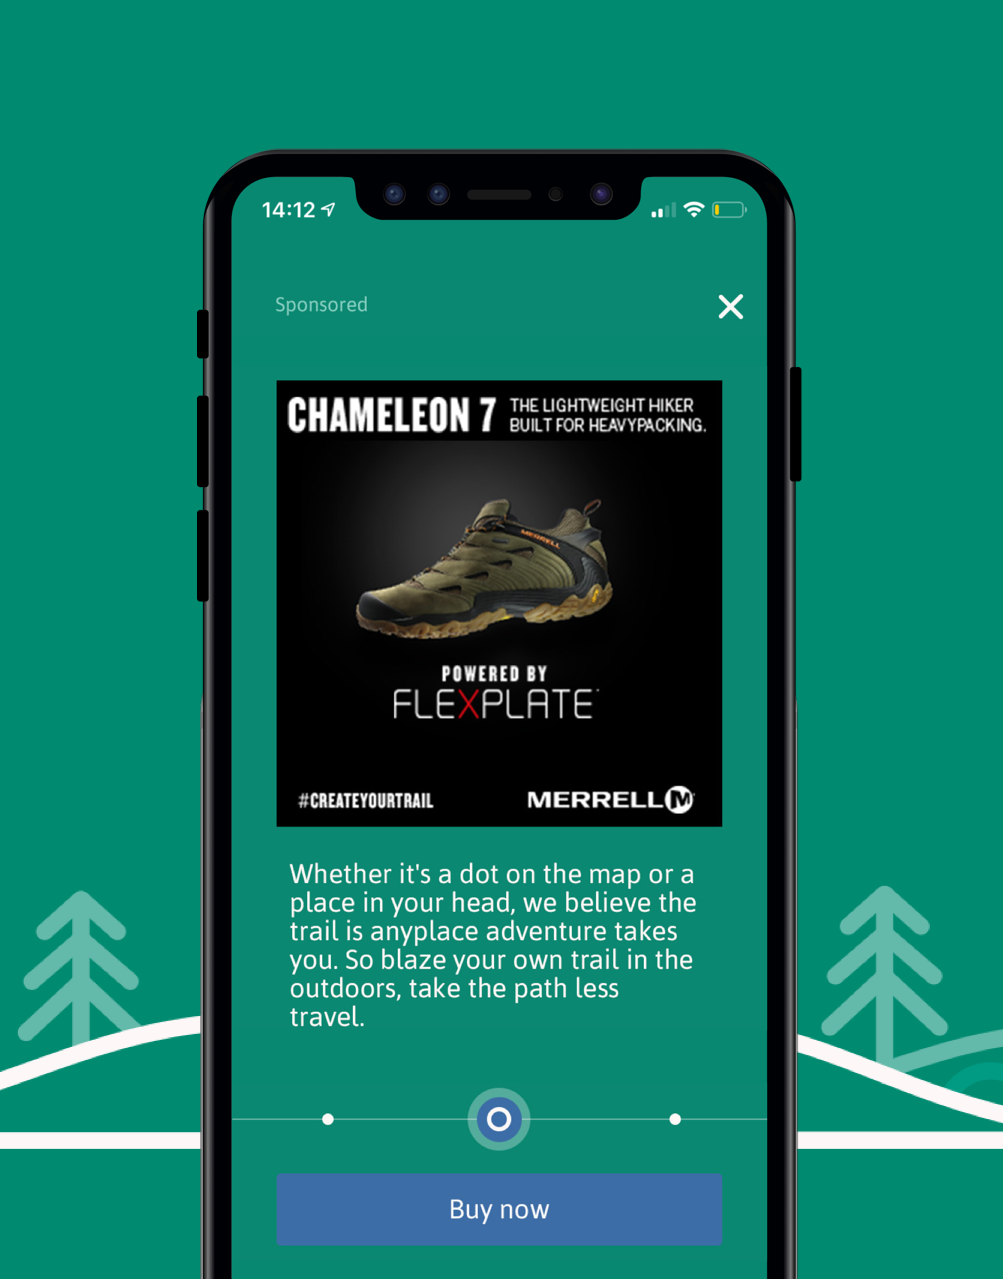 go-jauntly-mobile-walking-app-illustrated-bg copy.png